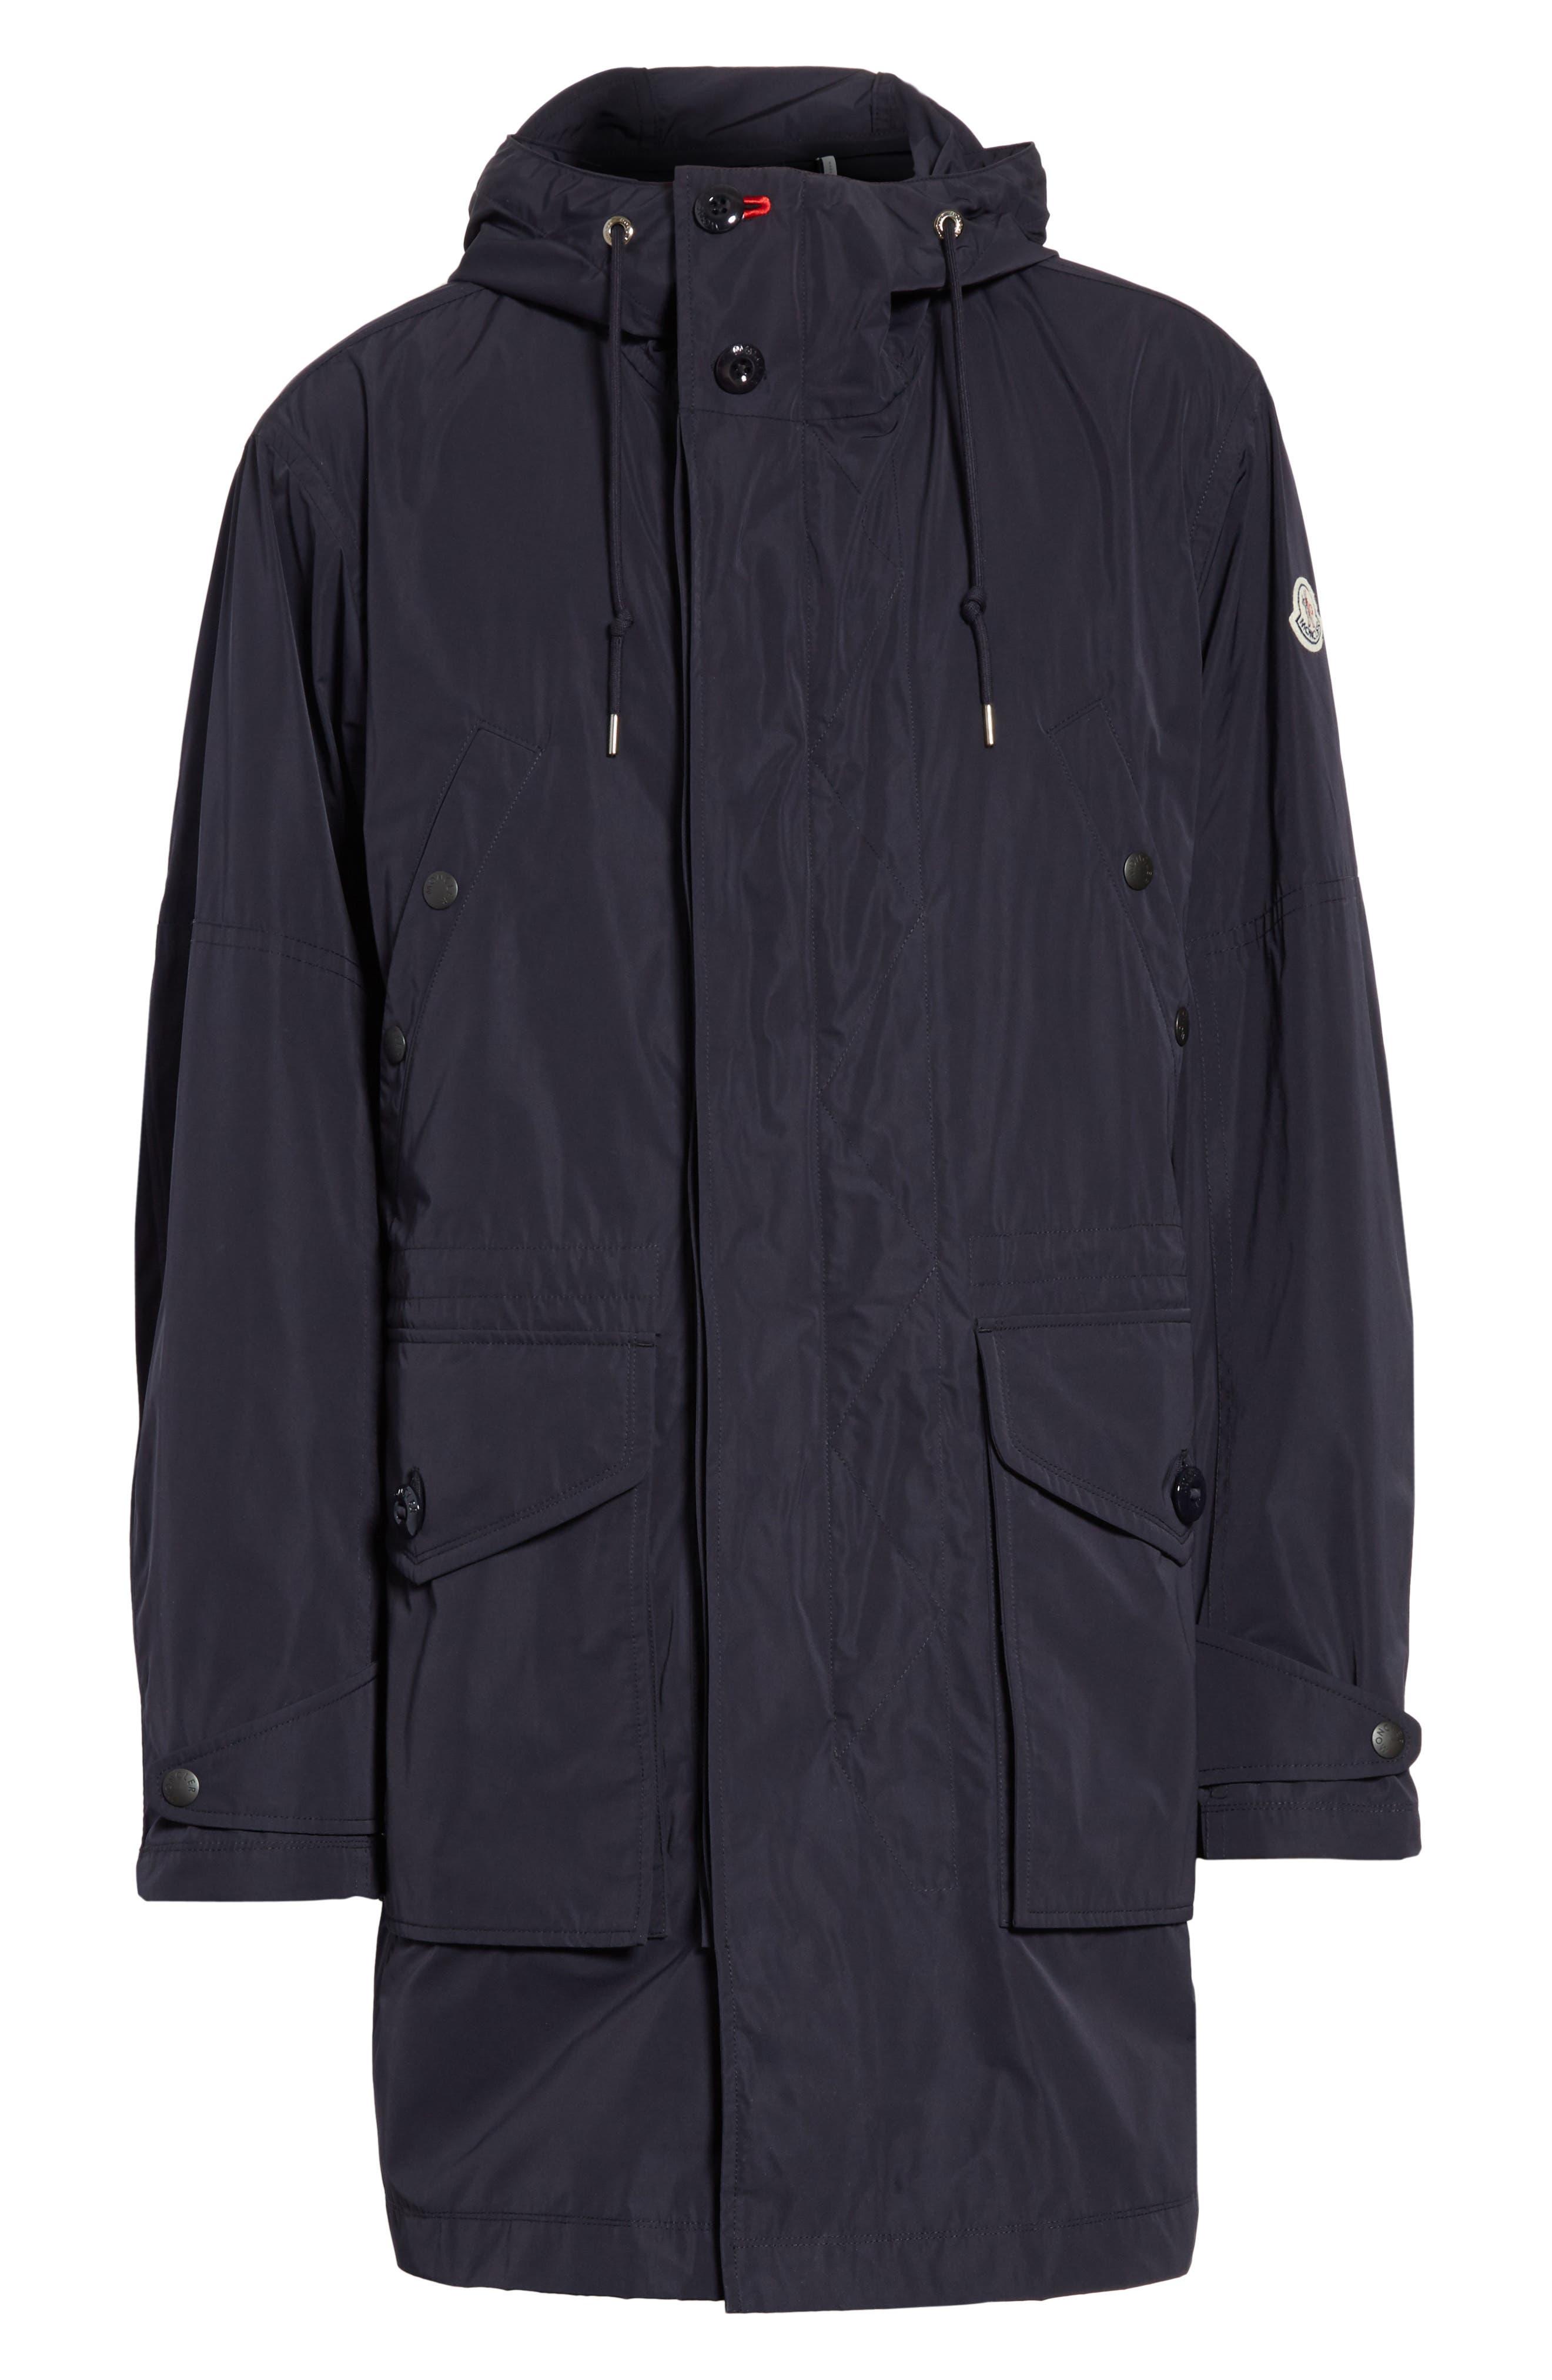 Guiers Long Raincoat,                             Alternate thumbnail 6, color,                             Navy